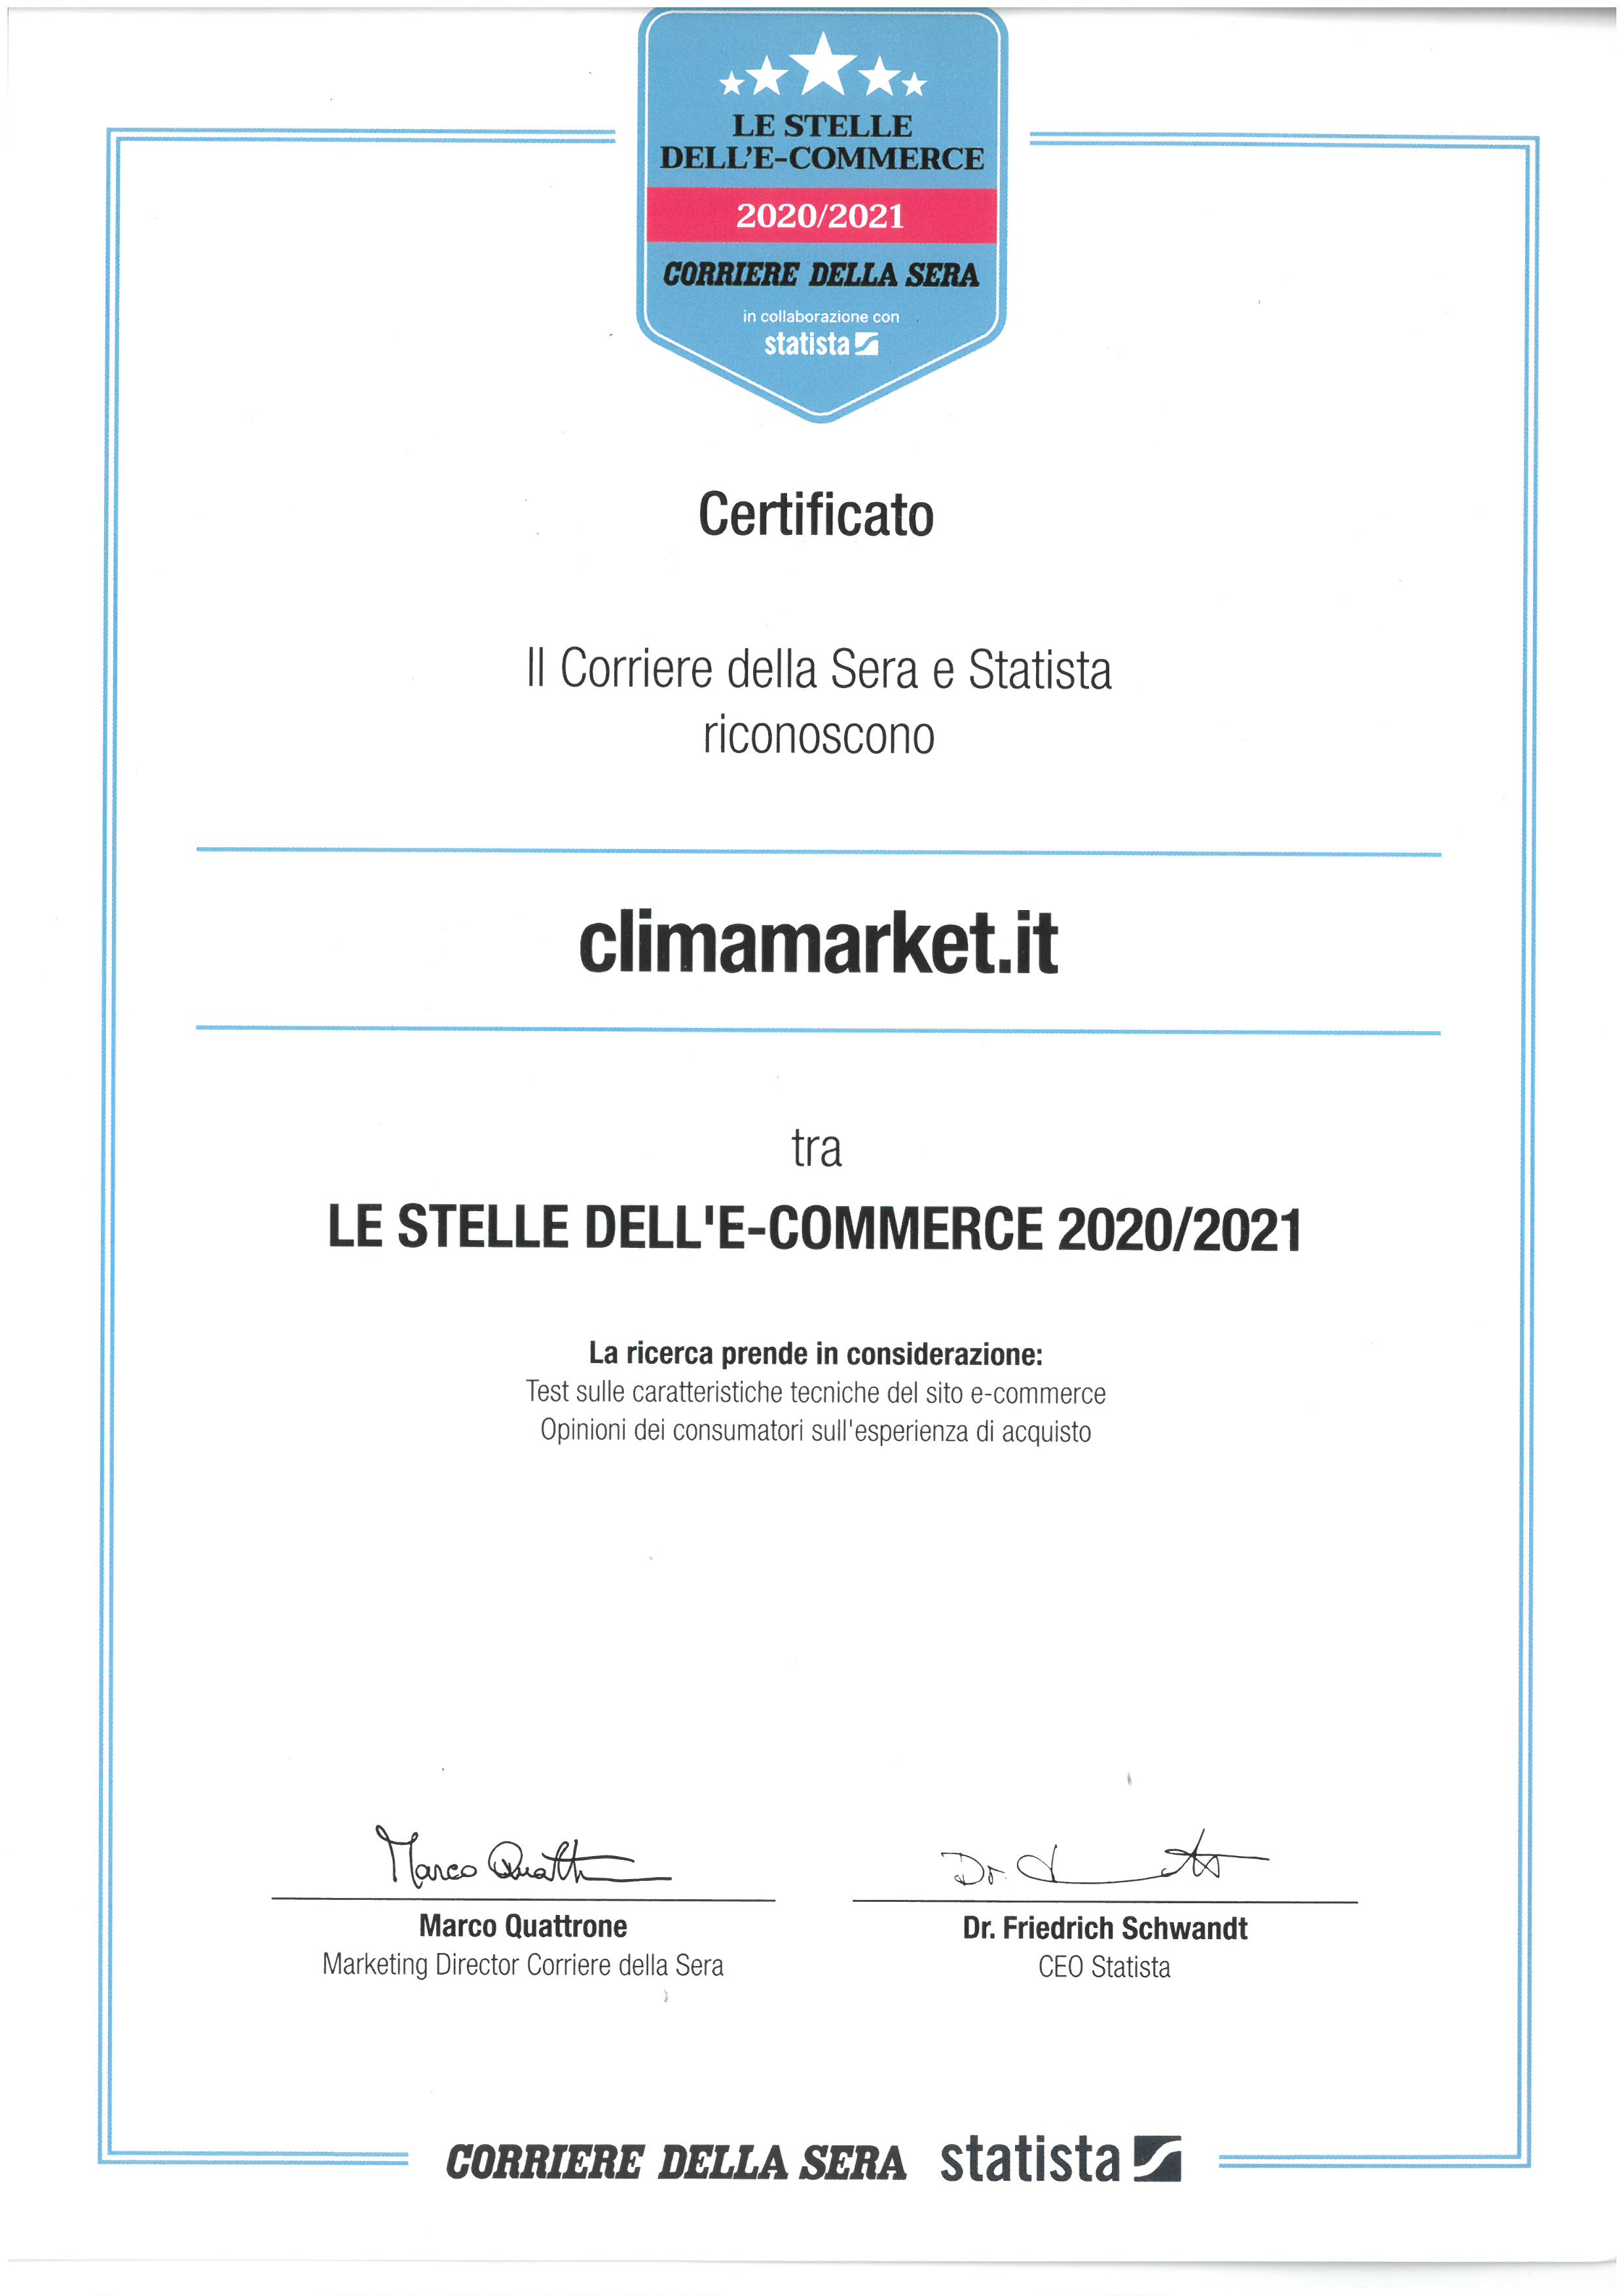 Climamarket: Tra Le Stelle Dell'e-Commerce 2020-2021